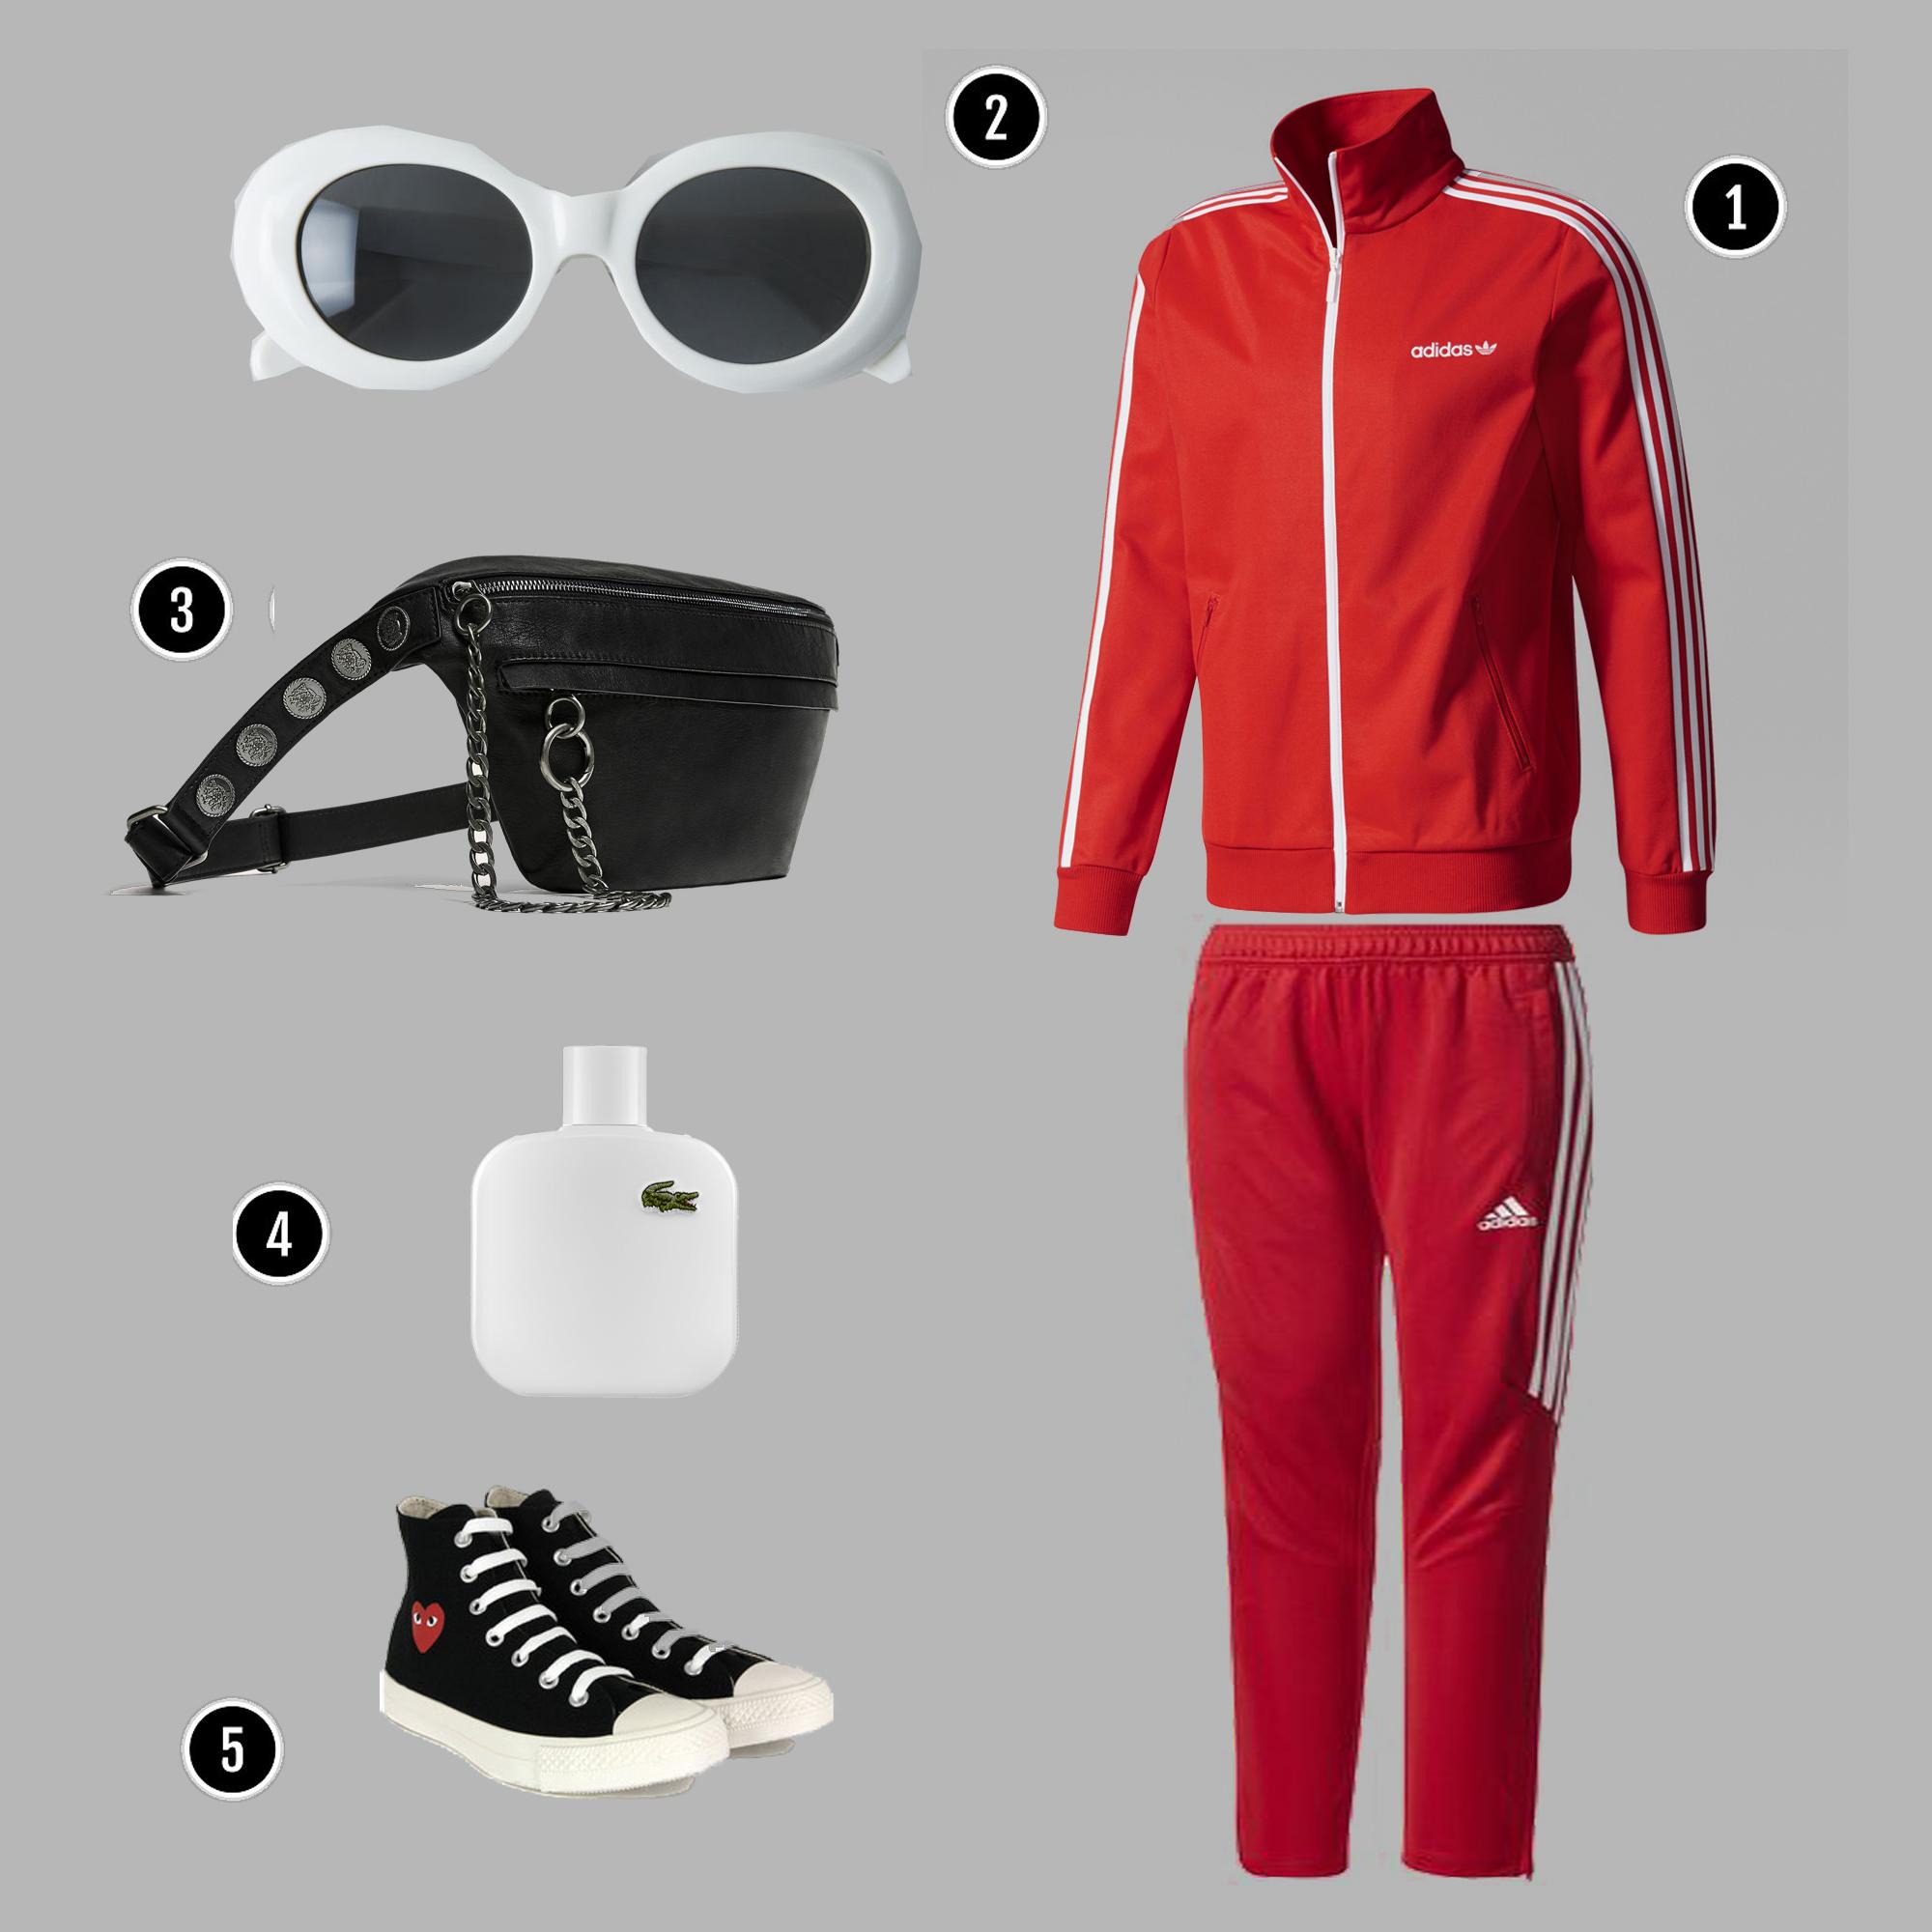 1. Áo + Quần : Adidas/ 2. Kính: Acne/ 3. Túi: Zara/ 4. Nước hoa: Lacoste / 5. Giày: CDG